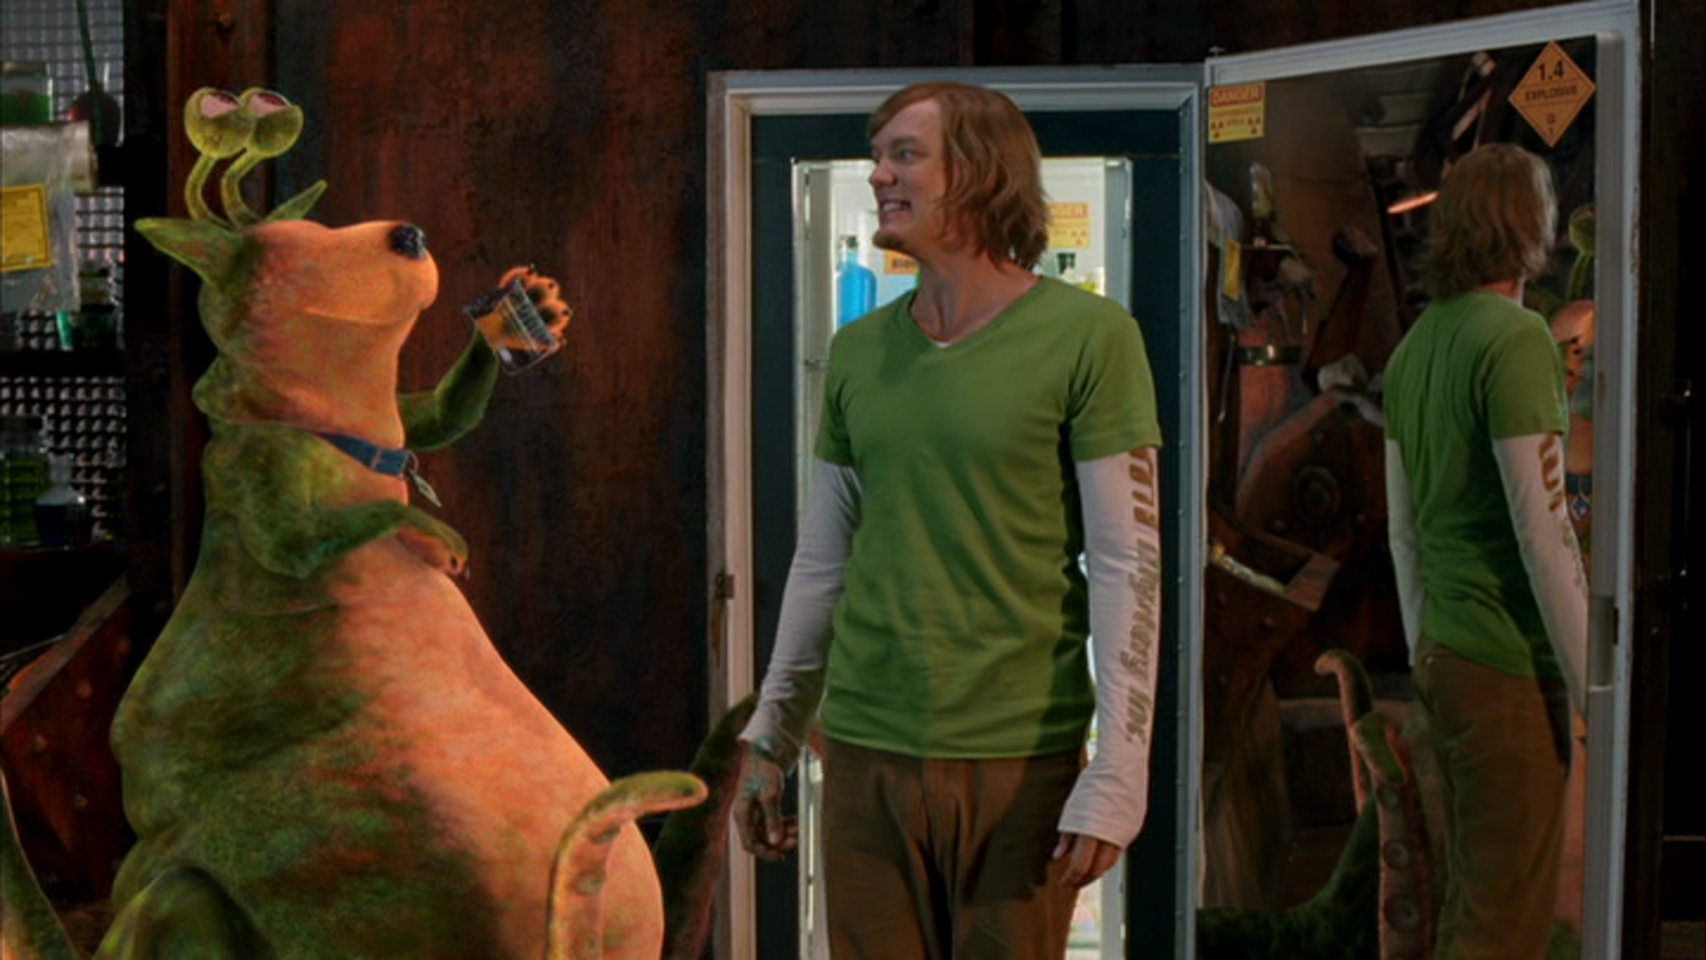 Scooby Doo 2 Monsters Unleashed Scooby Doo Image 21162338 फ न प प